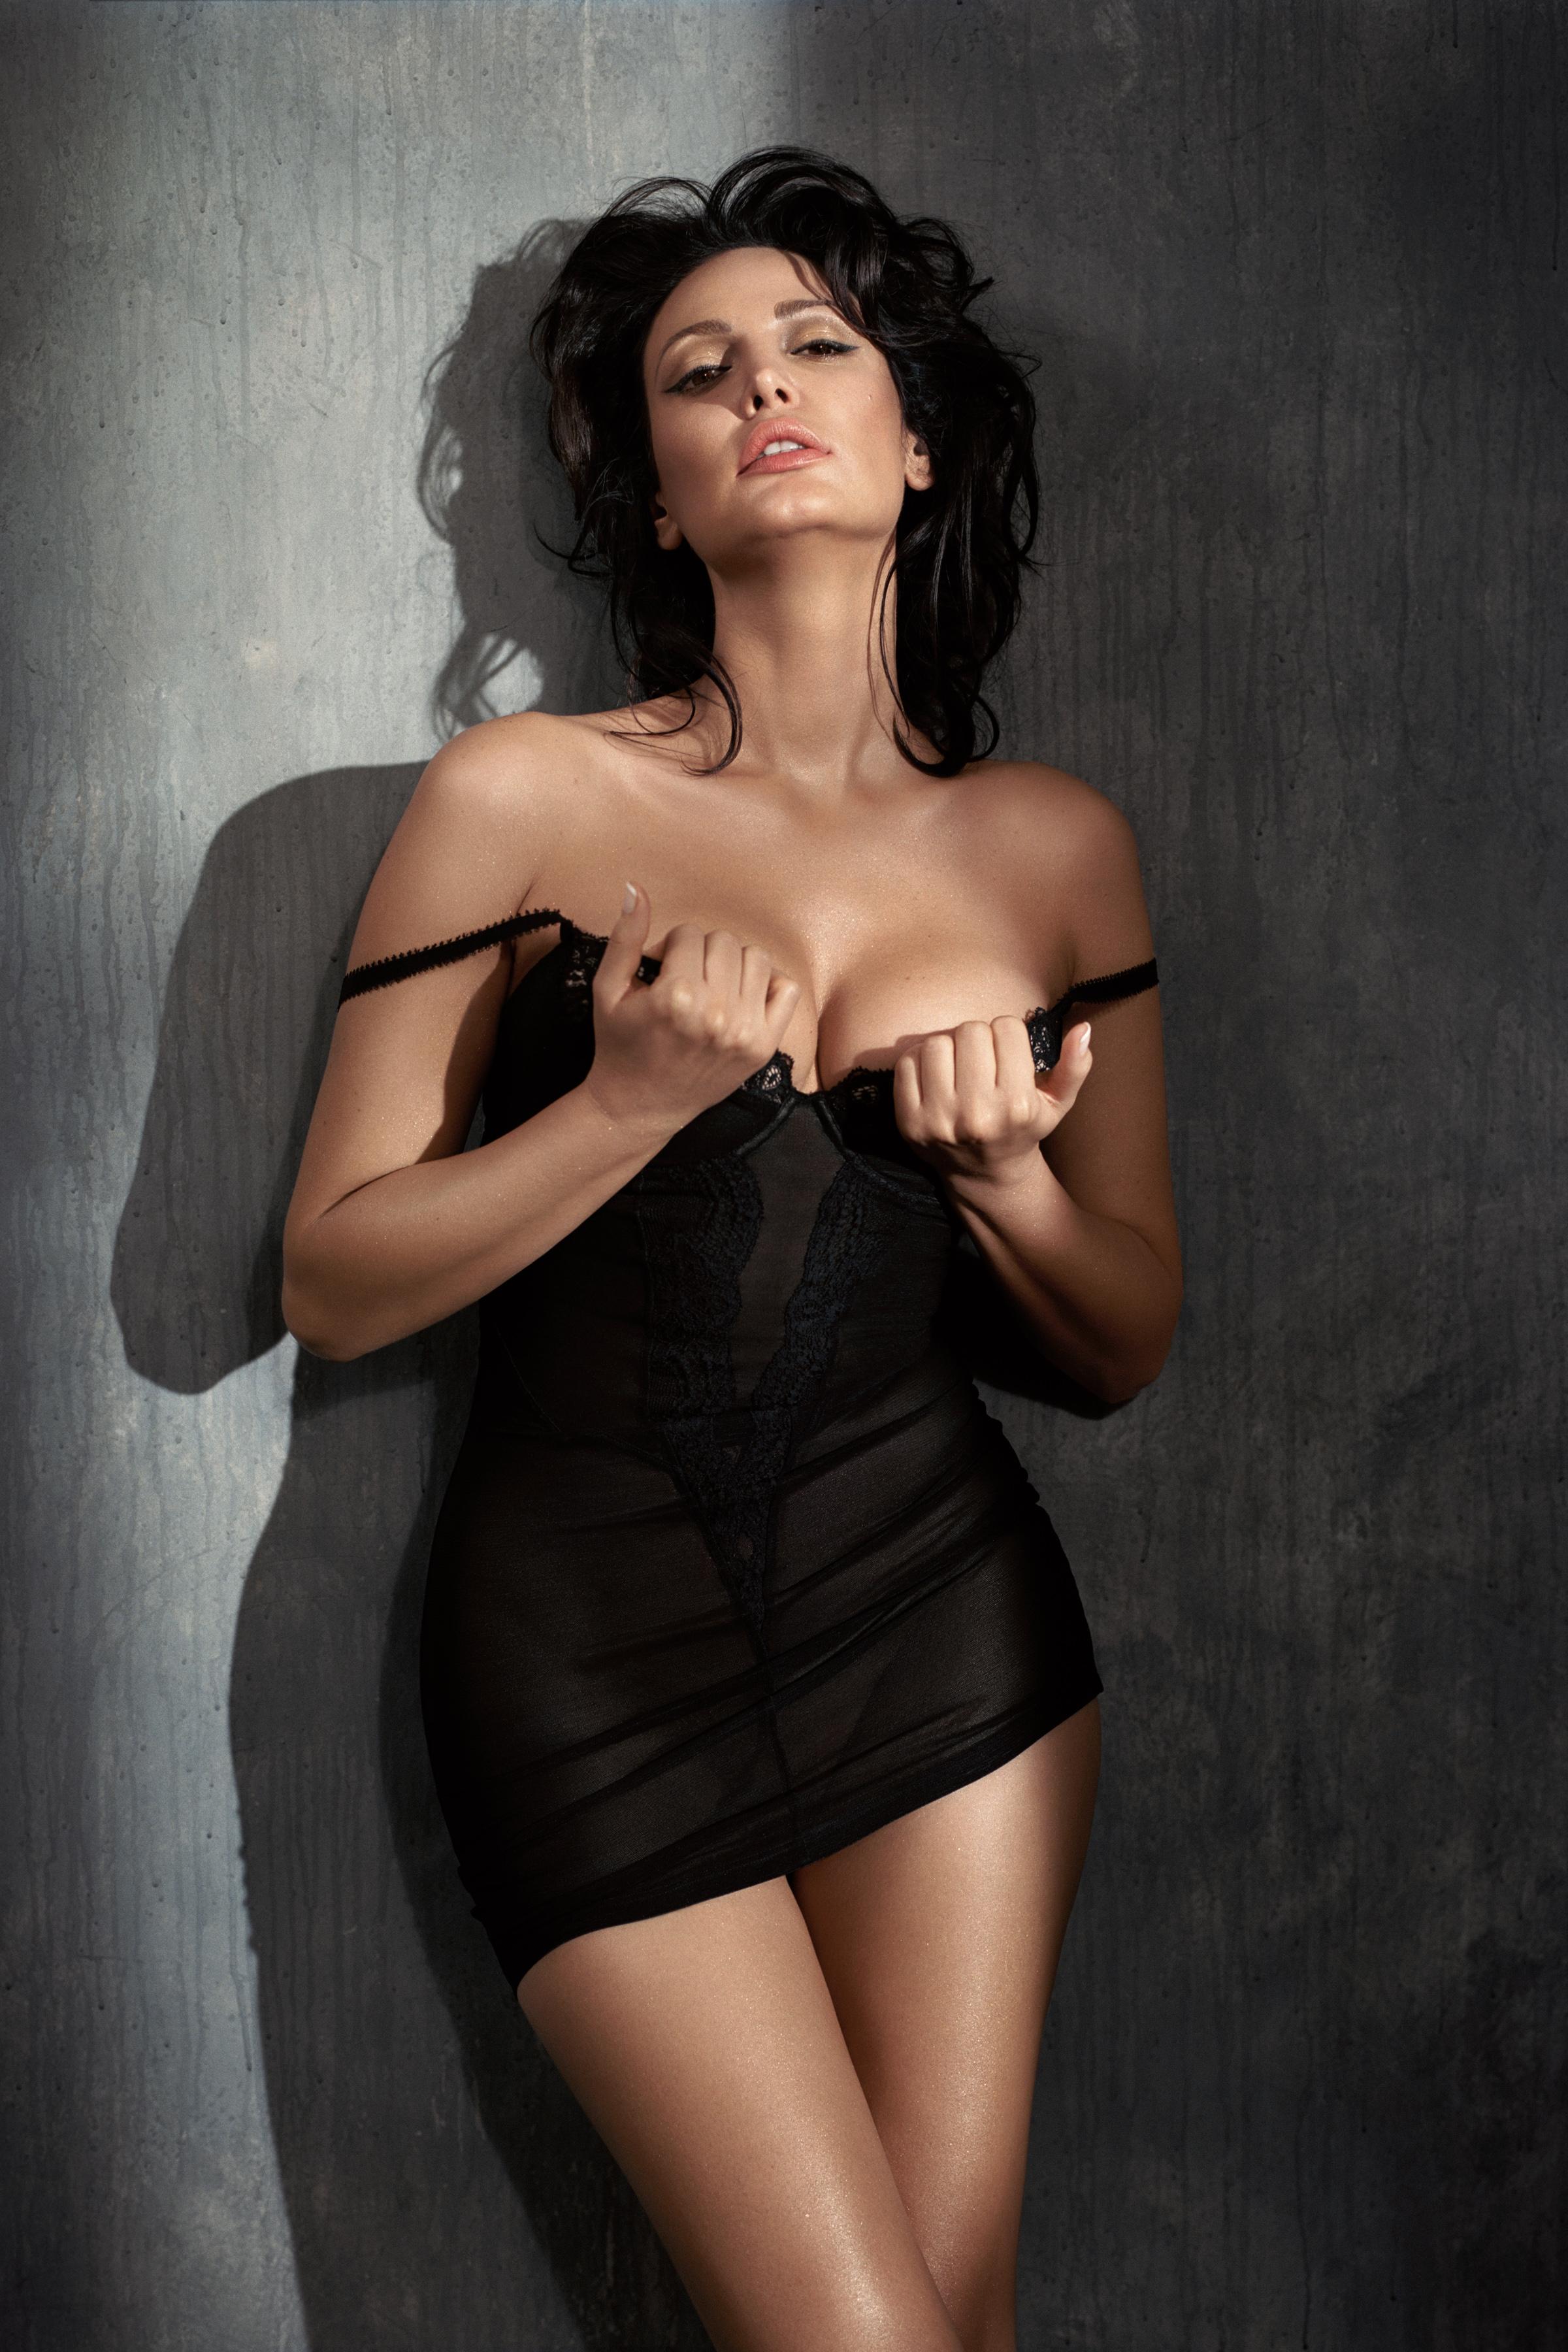 Paparazzi Bleona Qereti naked (96 photos), Ass, Hot, Twitter, cleavage 2019